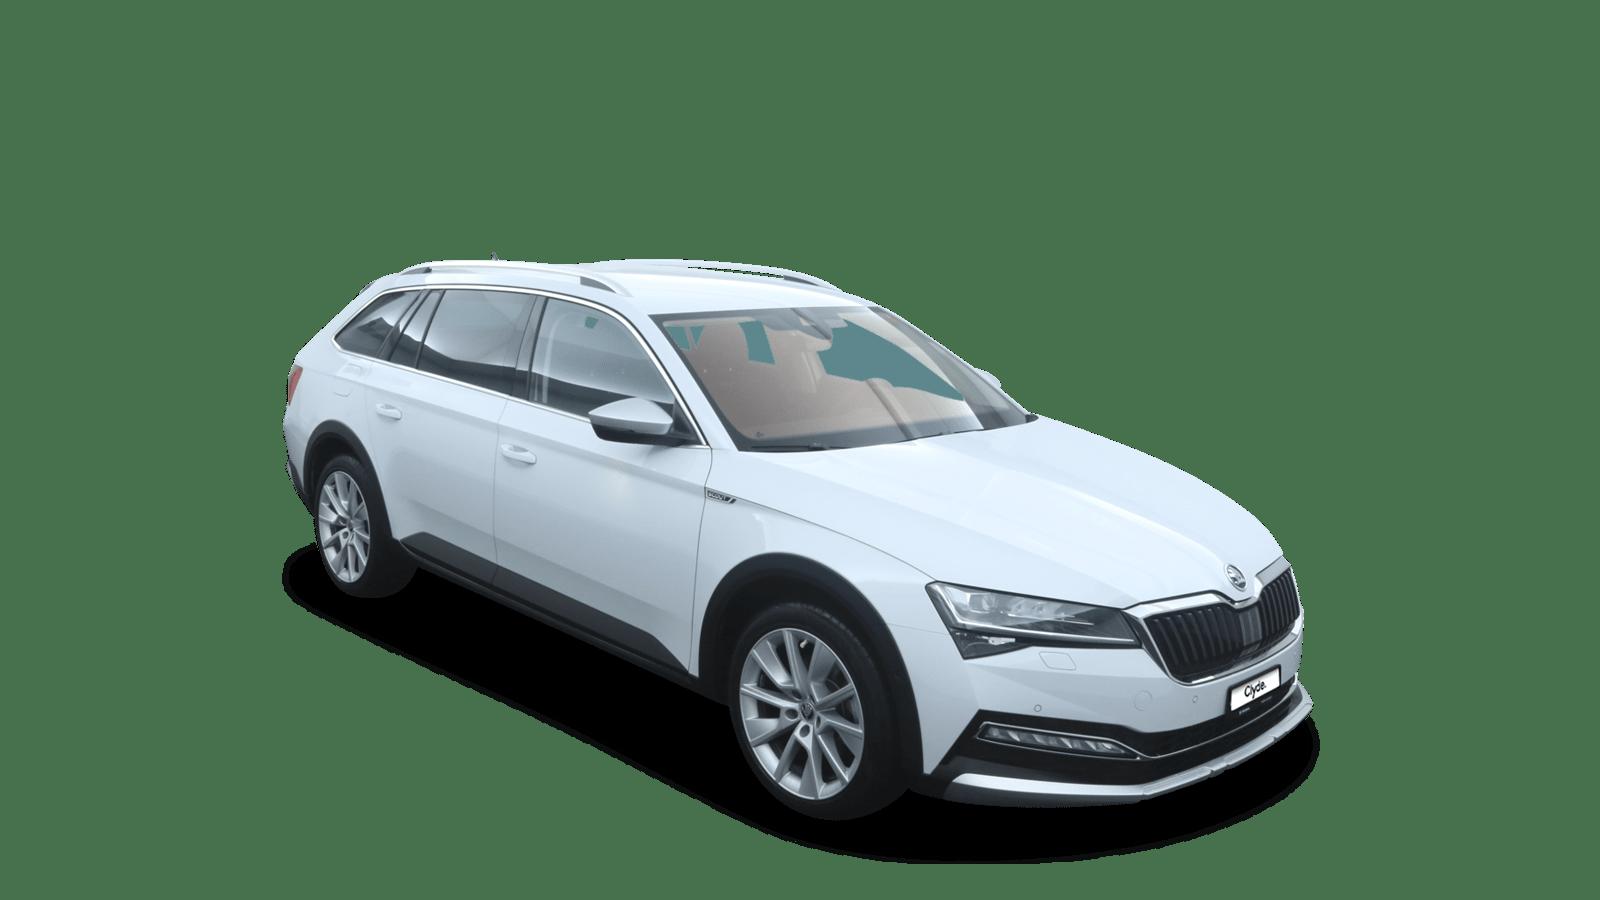 ŠKODA Superb White front - Clyde car subscription